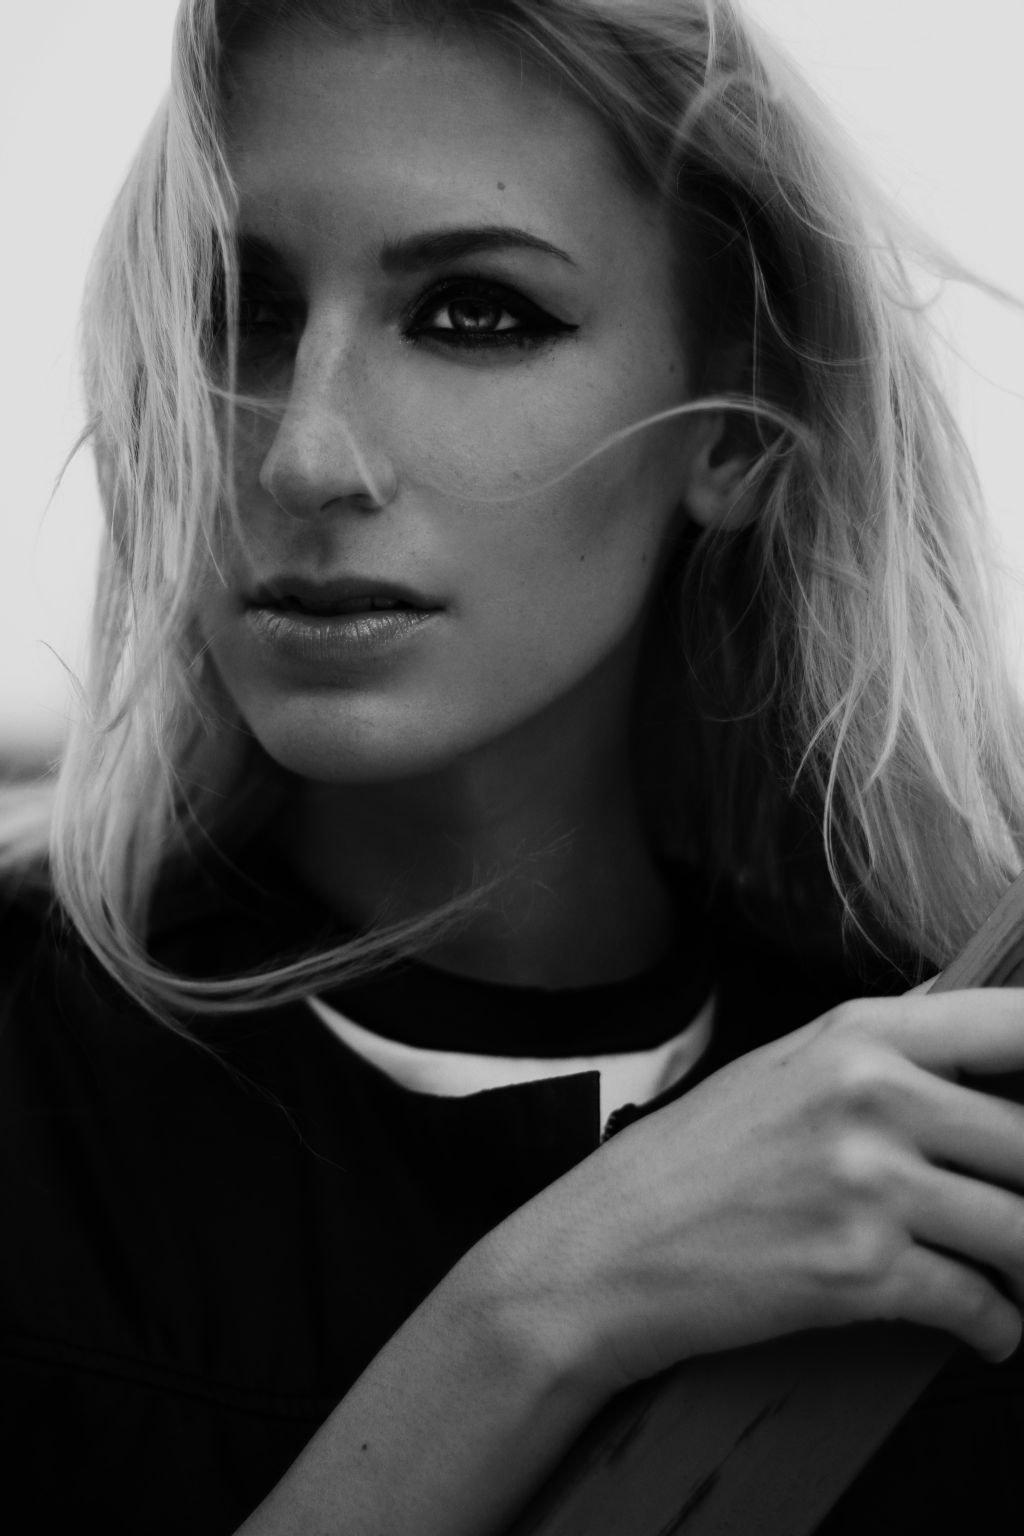 zuzana adam's Model portfolio